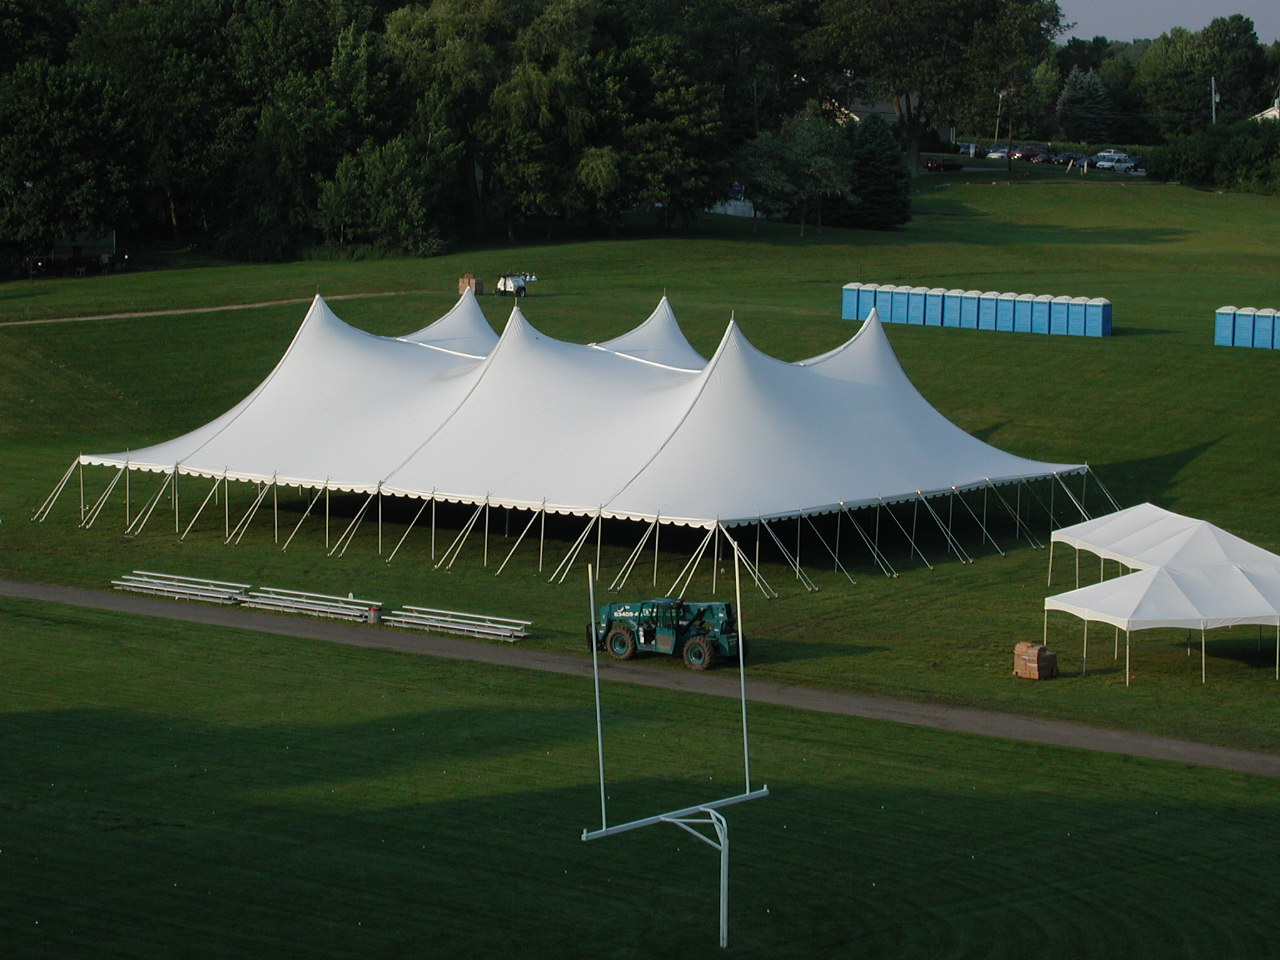 100'x120' Pole Tent